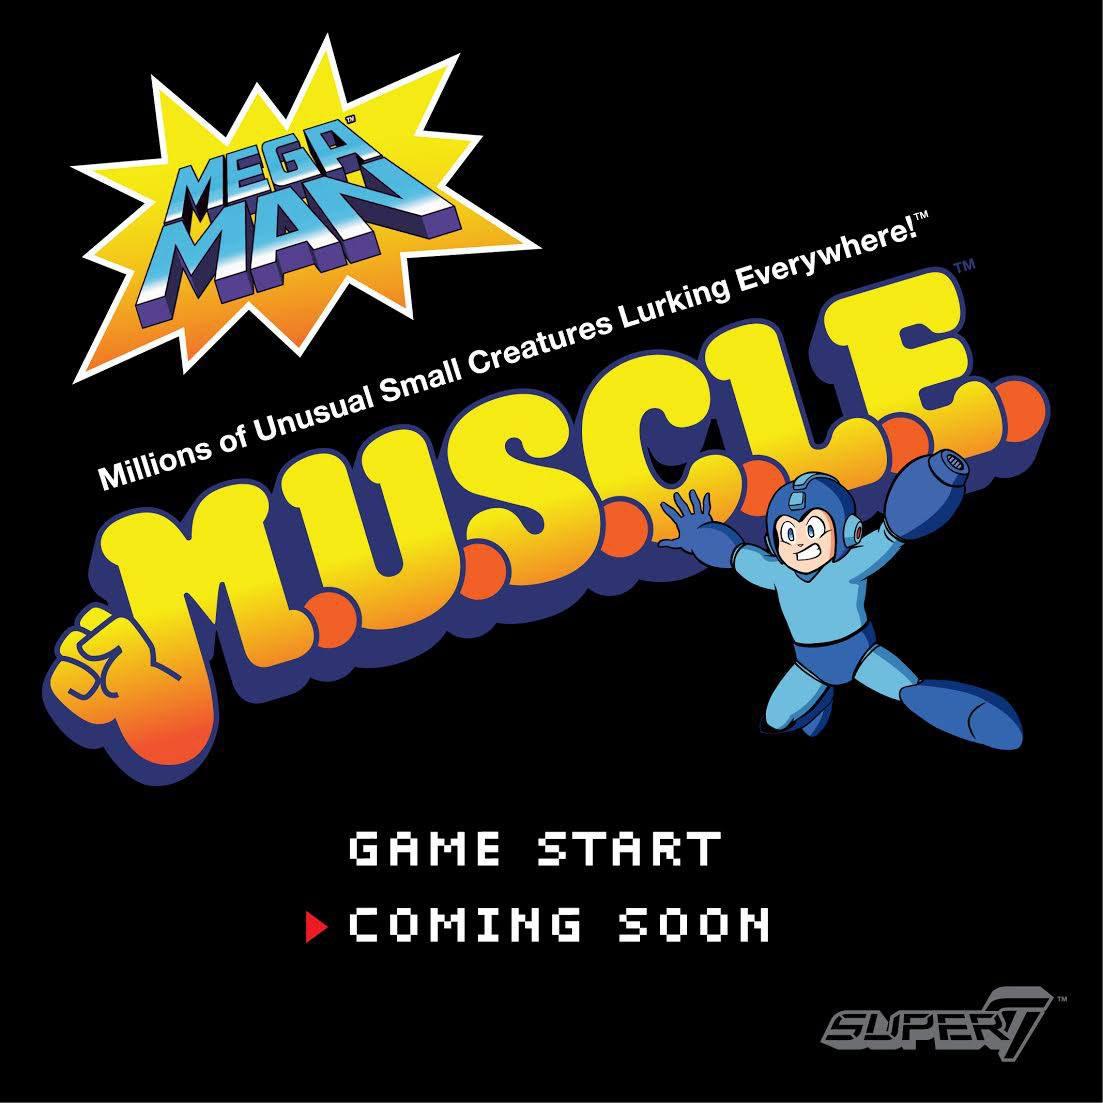 super7-mega-man-muscle-figures-preview